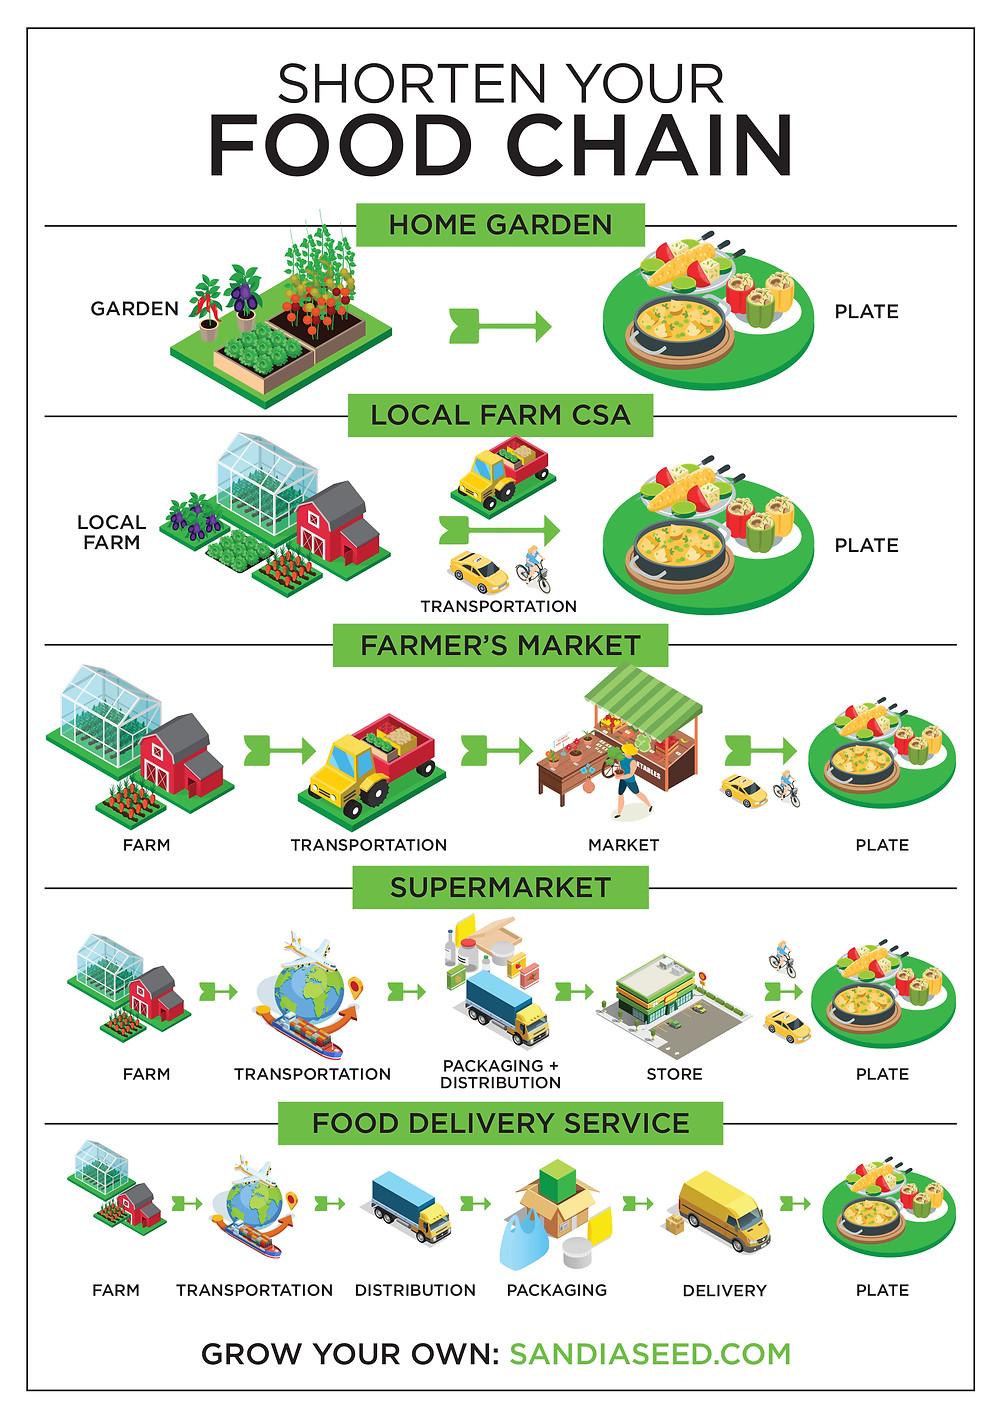 Denver SEO Expert - Infographic Designer for Food Chain Infographic